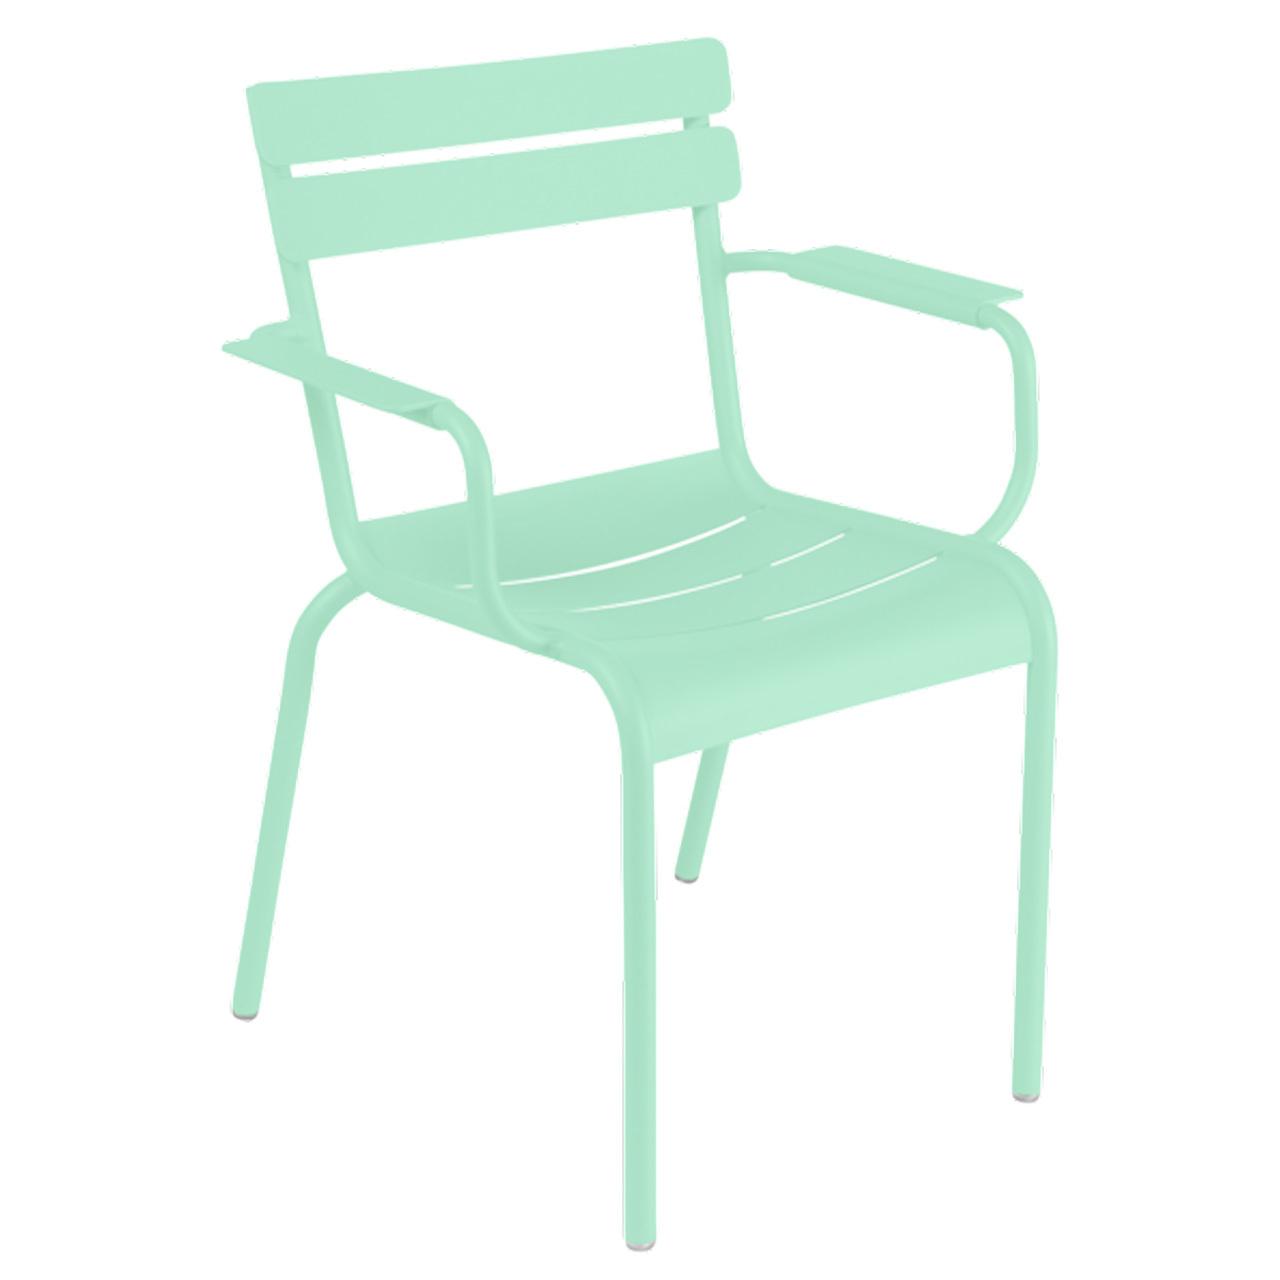 Fermob Luxembourg Stuhl Opalgrün 42 Stuhl mit Armlehnen